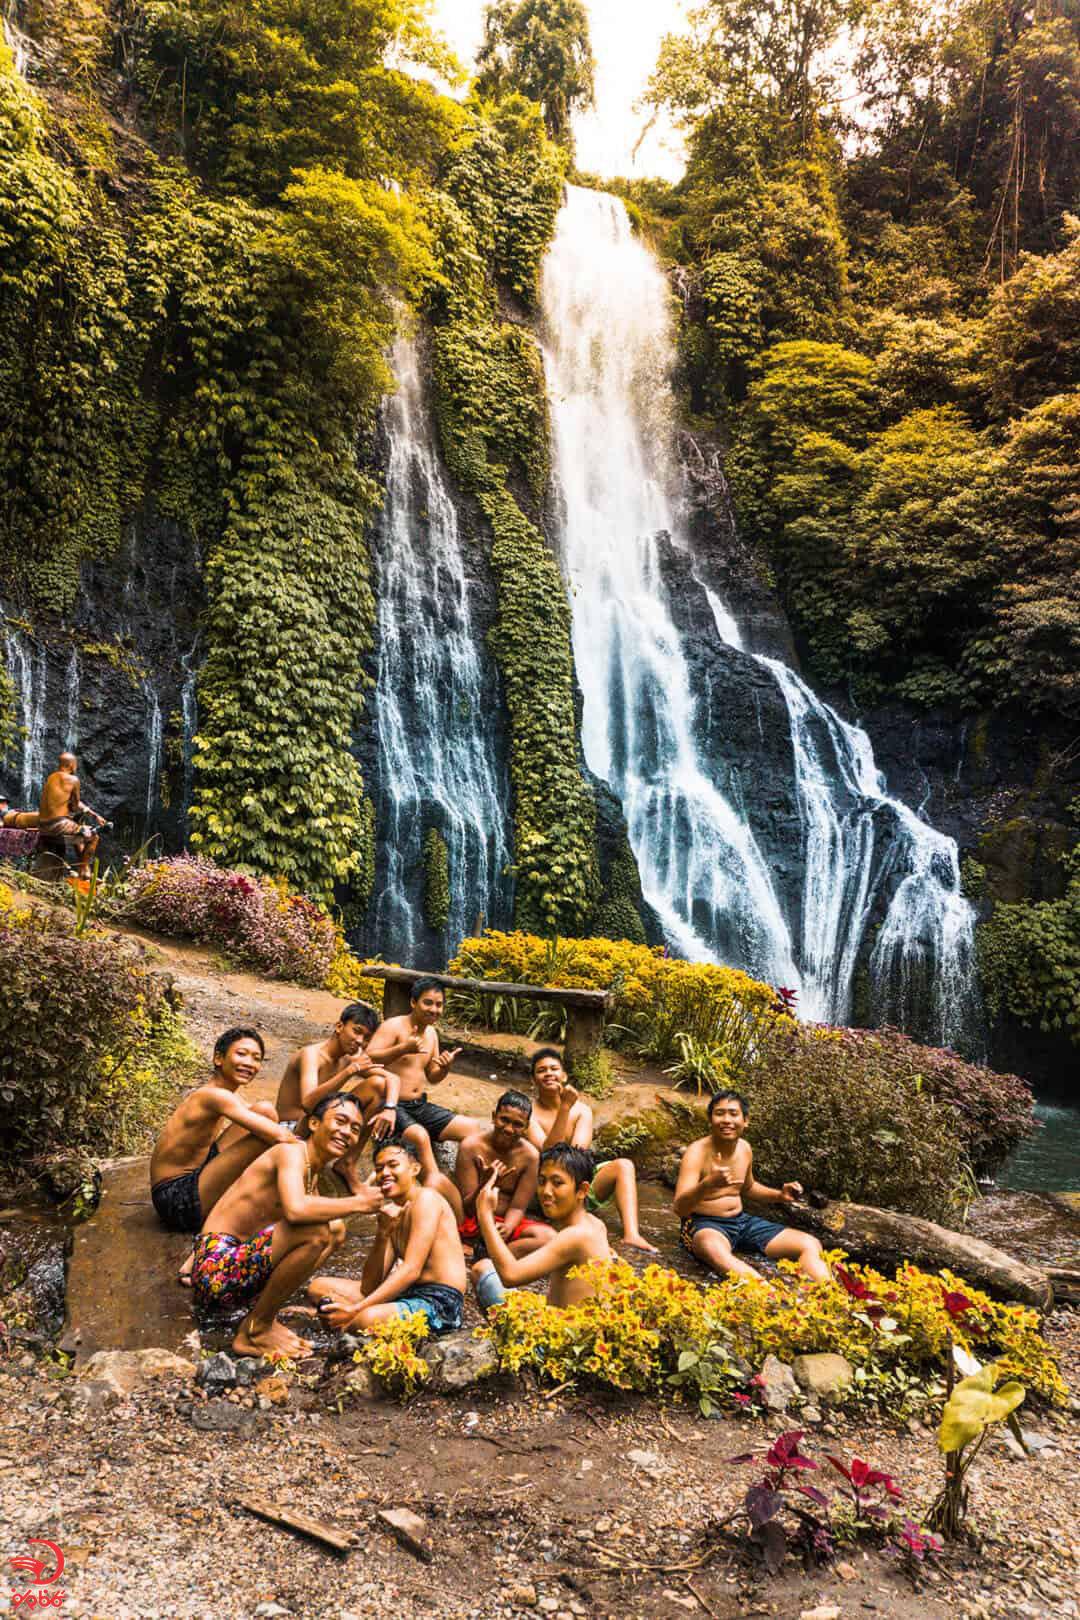 آبشار دوقلو بنیموالا بالی